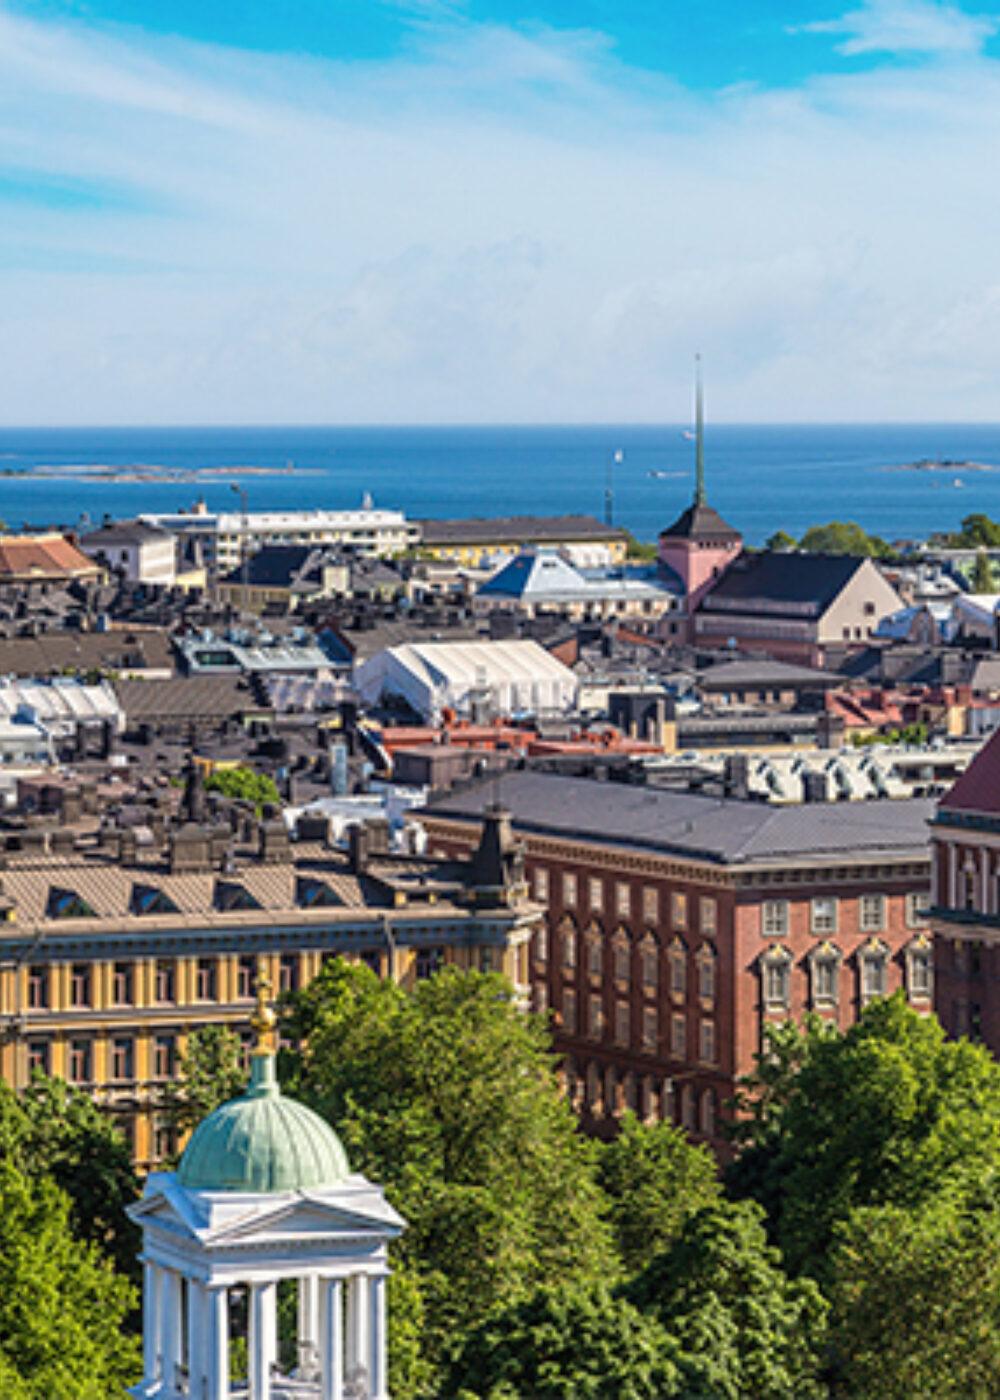 Green Motion Car Rental Finland Helsinki Downtown Hotel Valo 1440x400